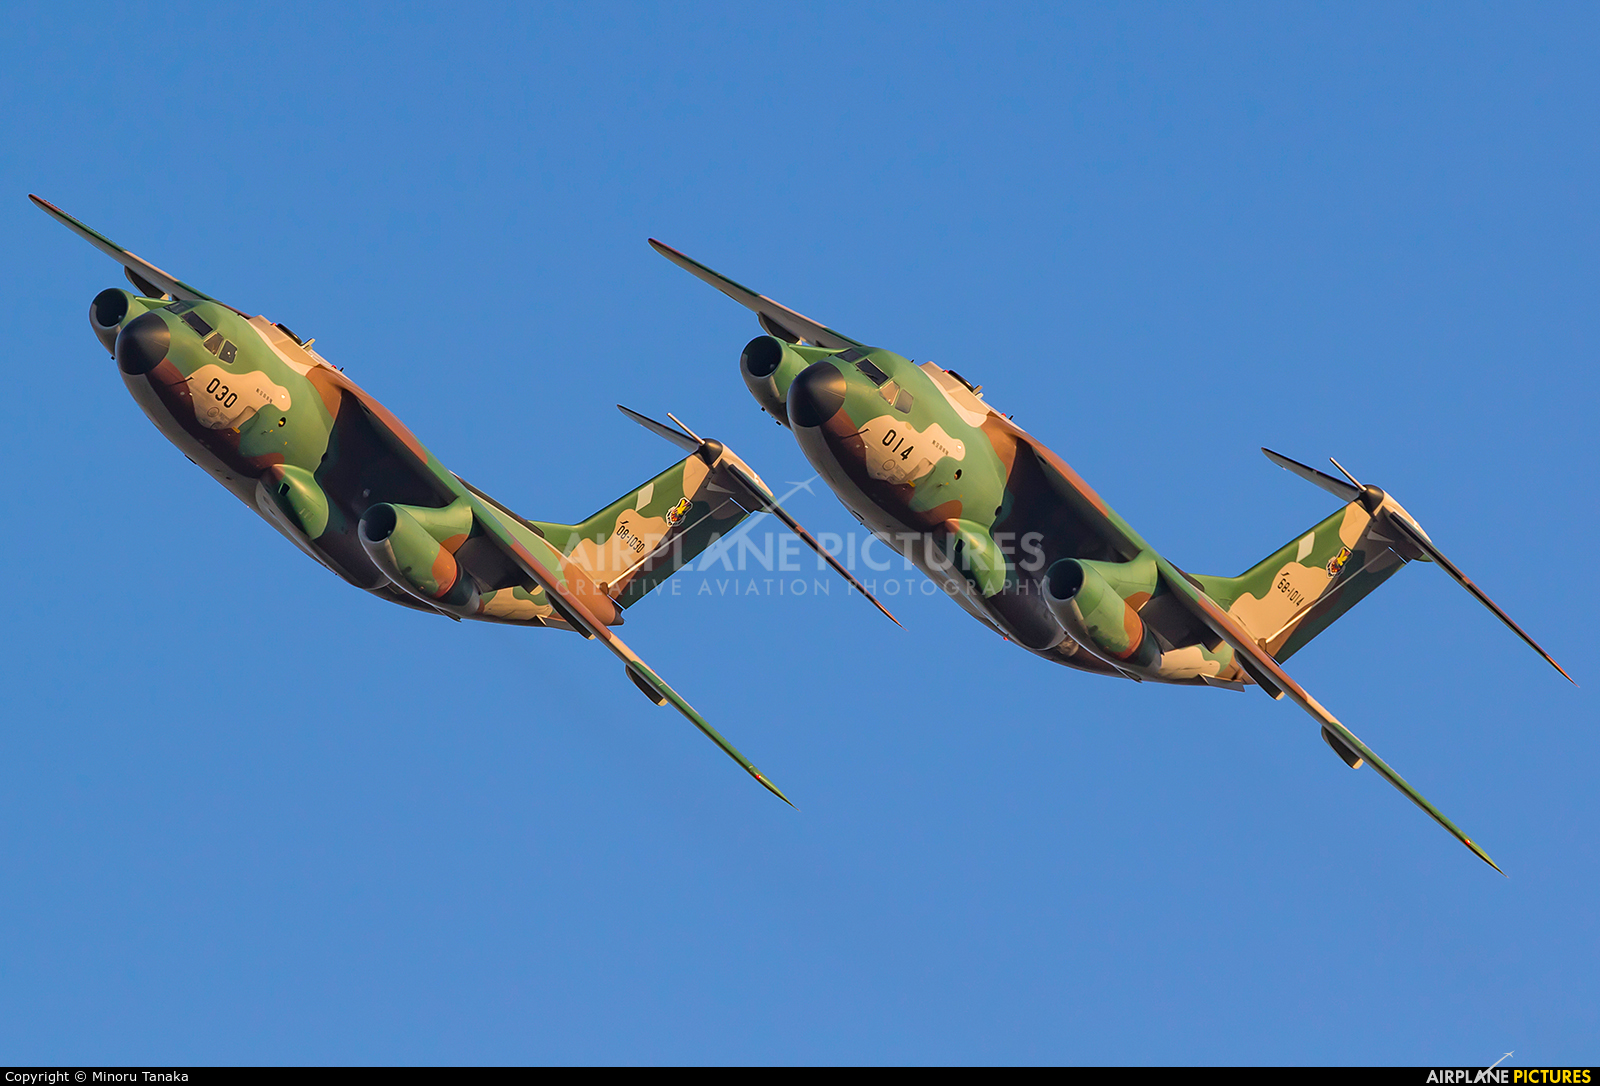 Japan - Air Self Defence Force 68-1014 aircraft at Iruma AB